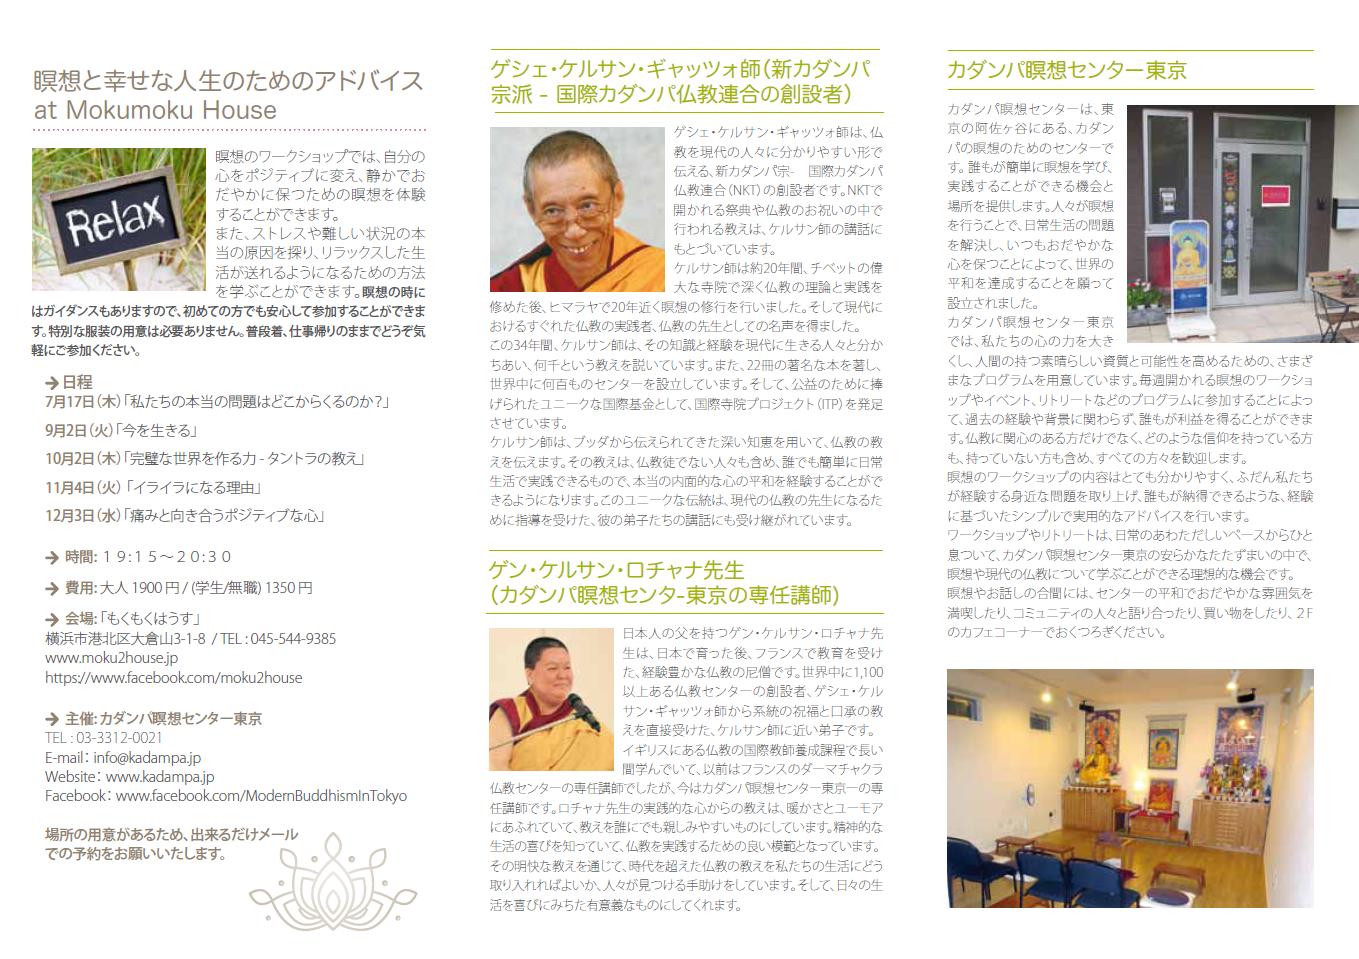 H26.7.17(木)   ガダンパ瞑想  at mokumoku